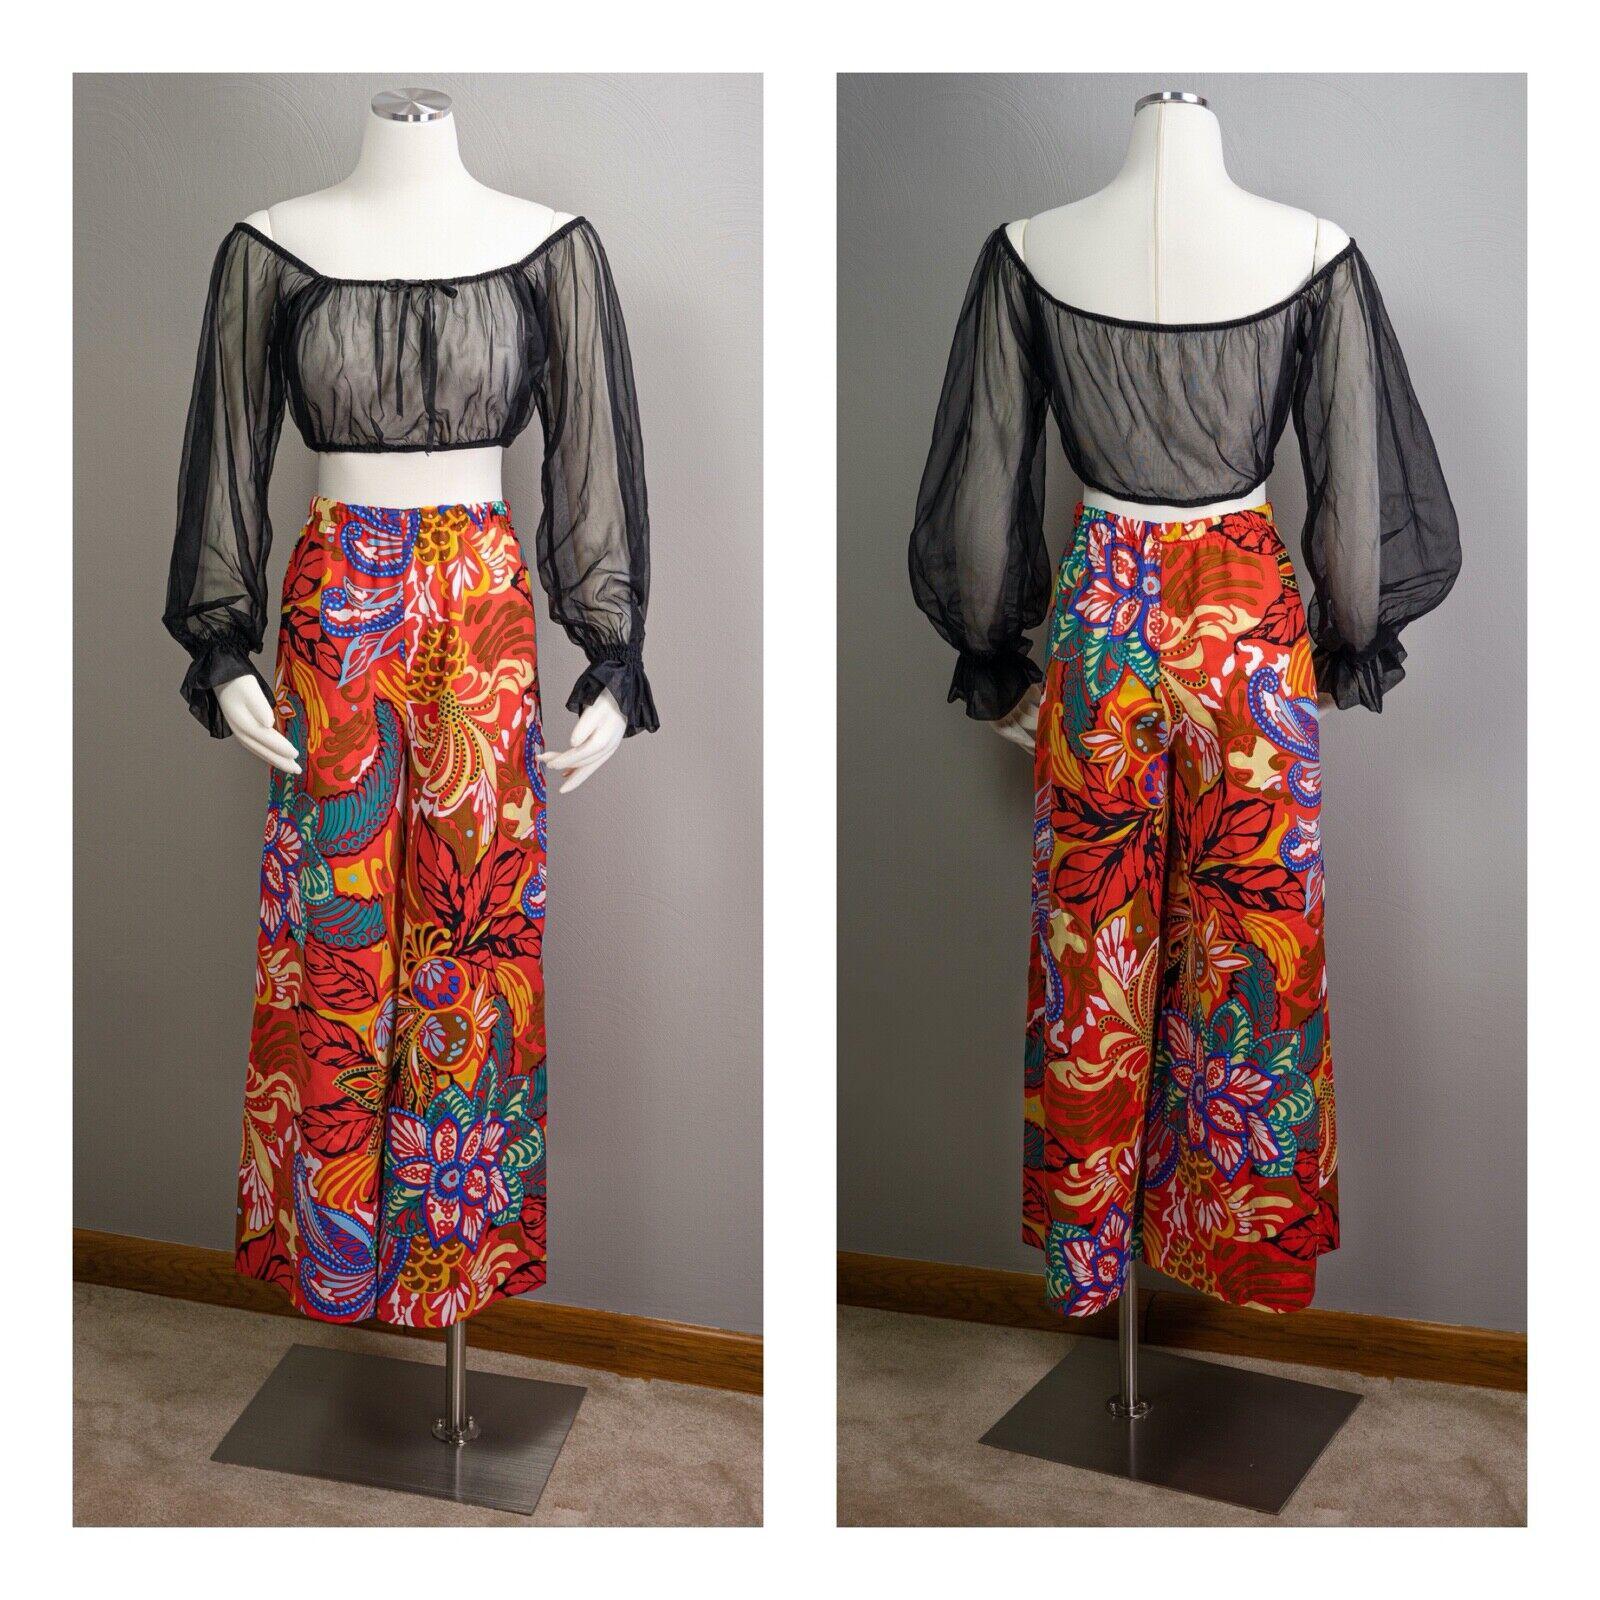 70s Sheer Peasant Crop Top Pants Sets, wide leg p… - image 1